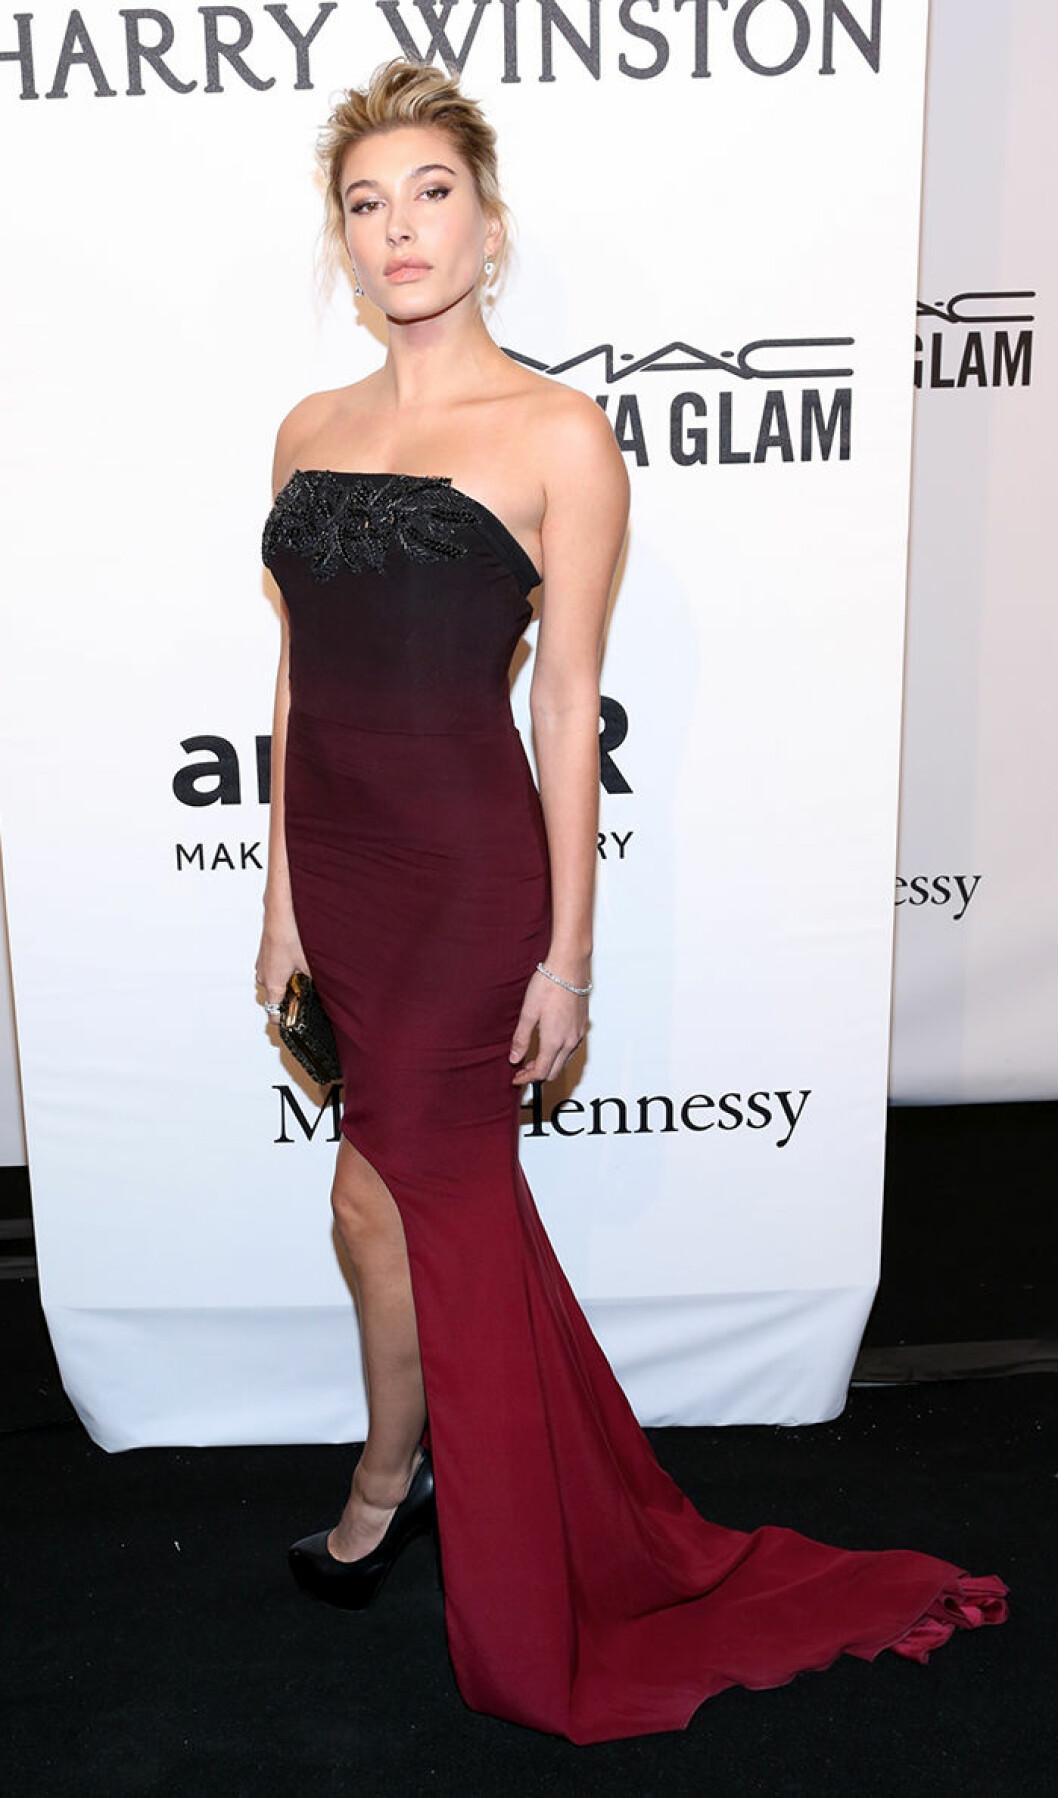 Hailey Baldwin seen attending the 2015 amfAR New York Gala at Cipriani Wall Street